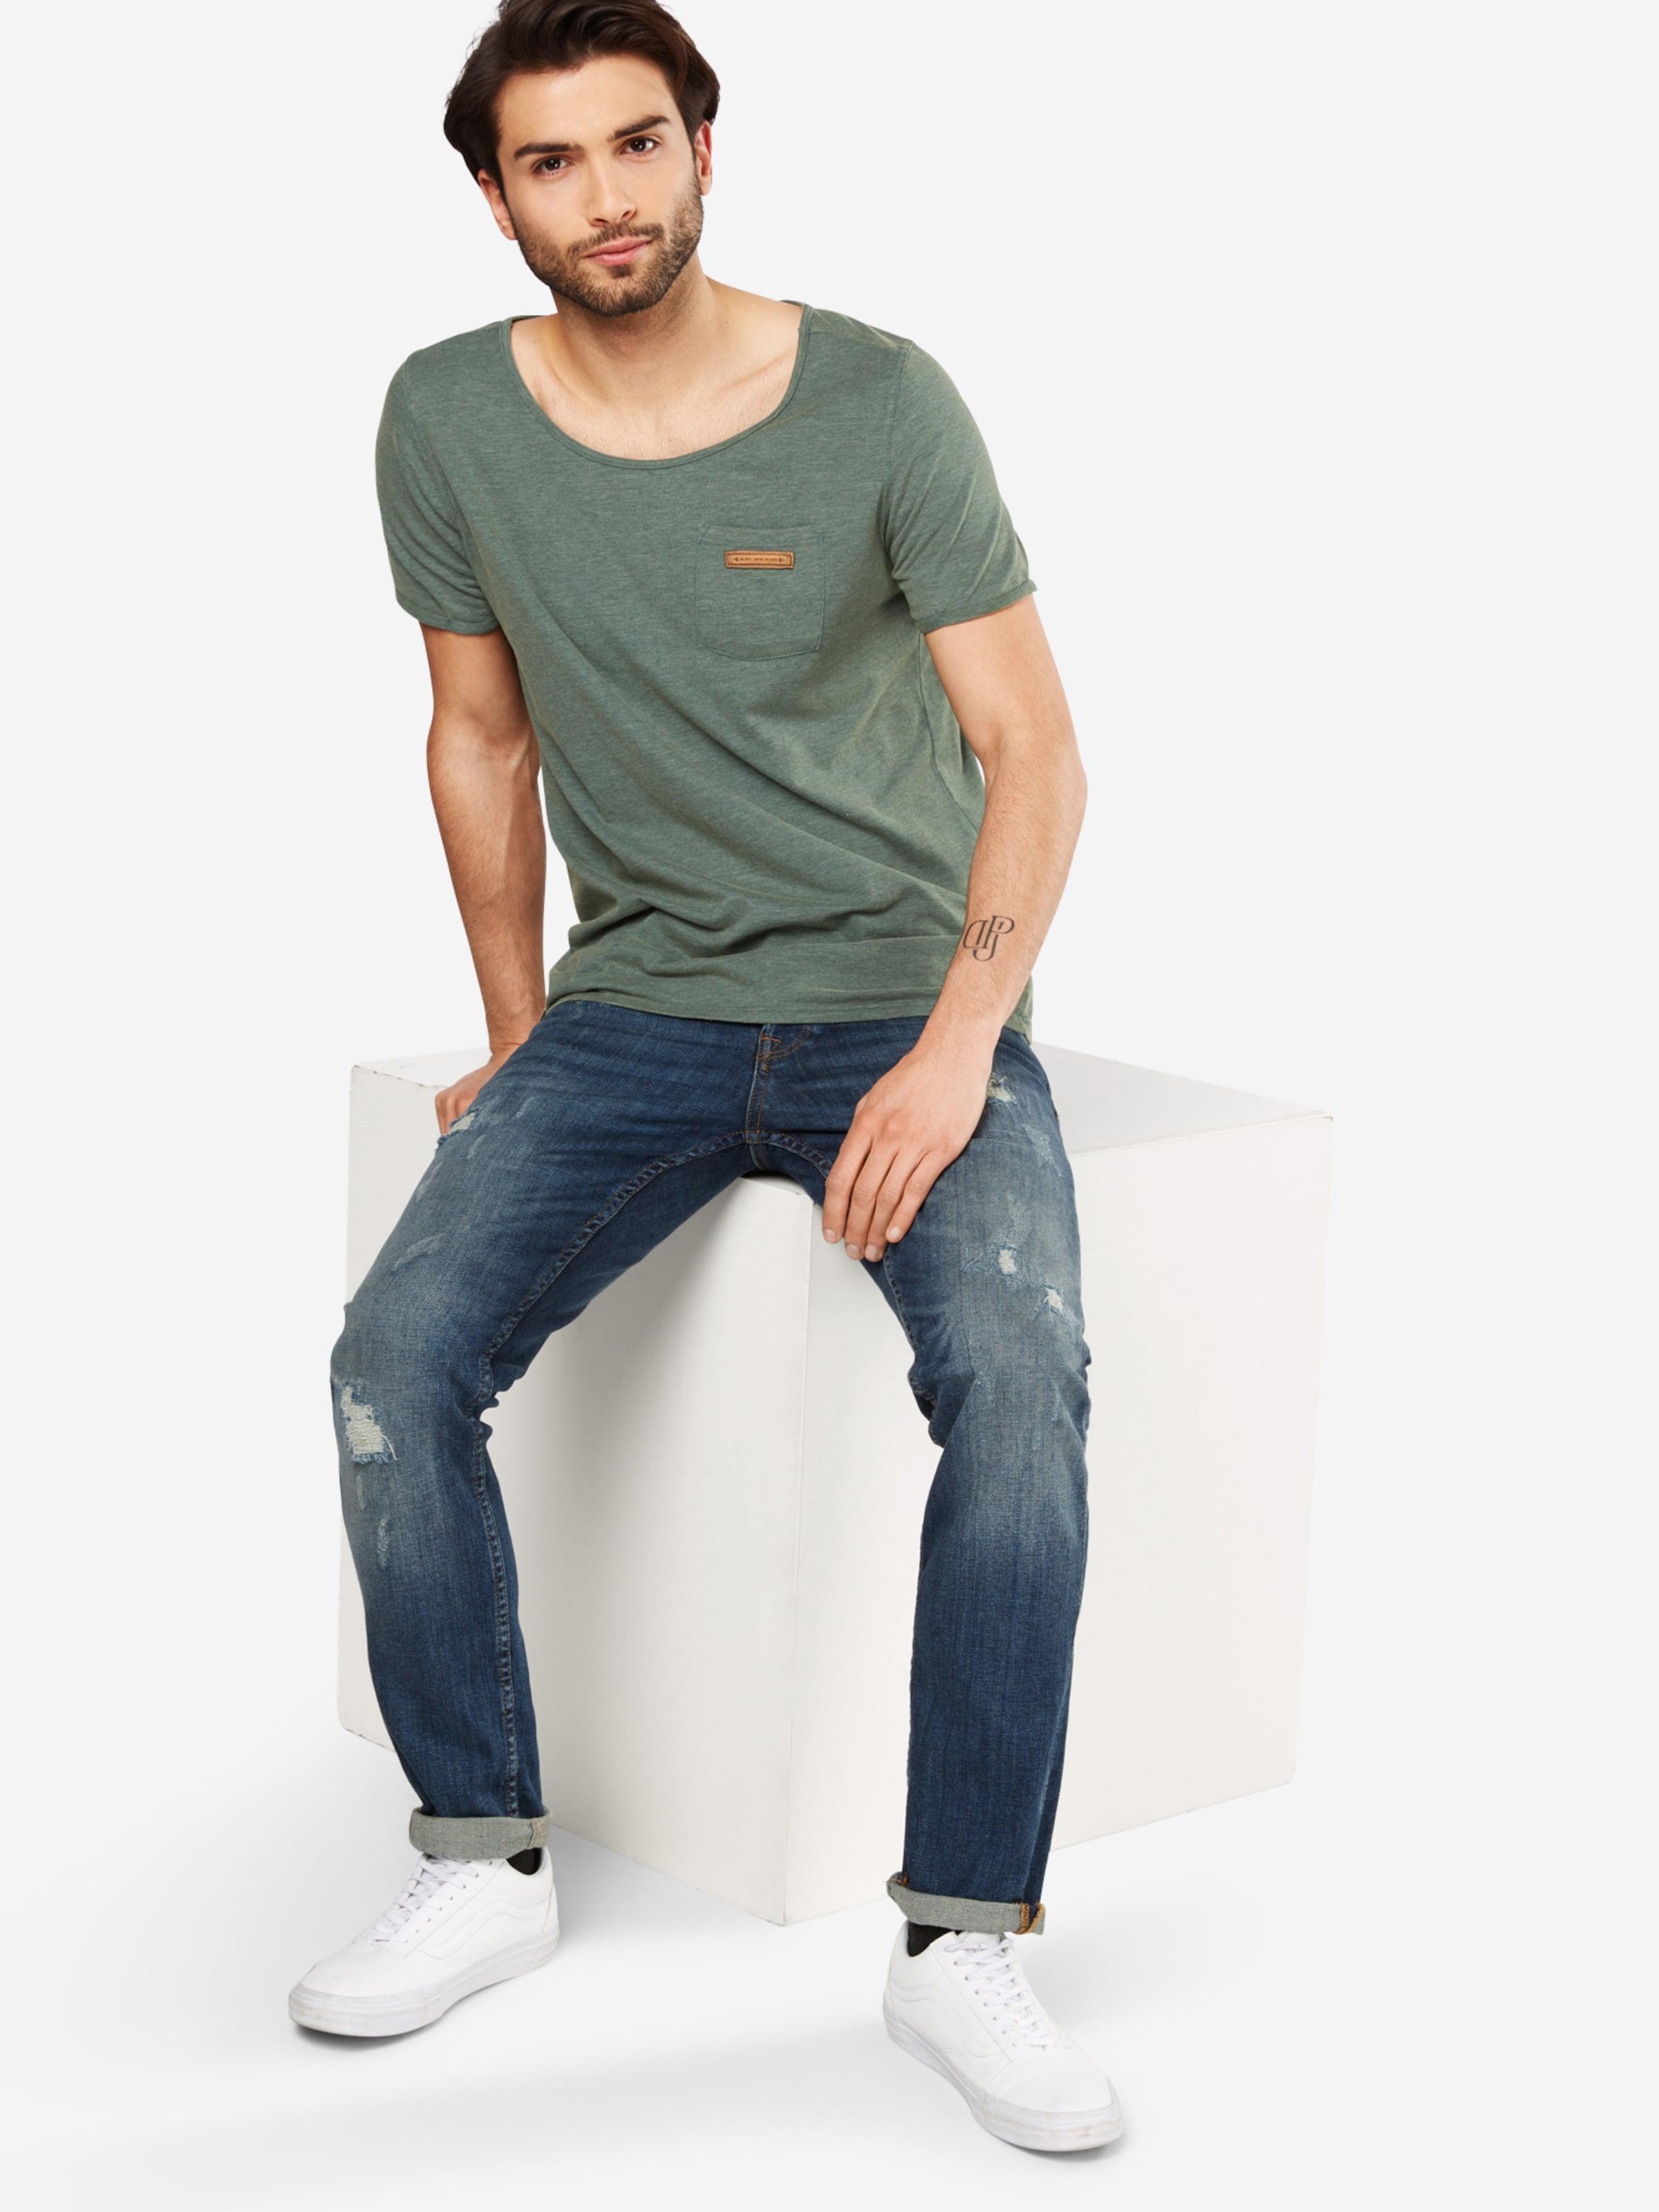 shirt 'fashionopfa Dunkelgrün Naketano T I' In tshrdQCx